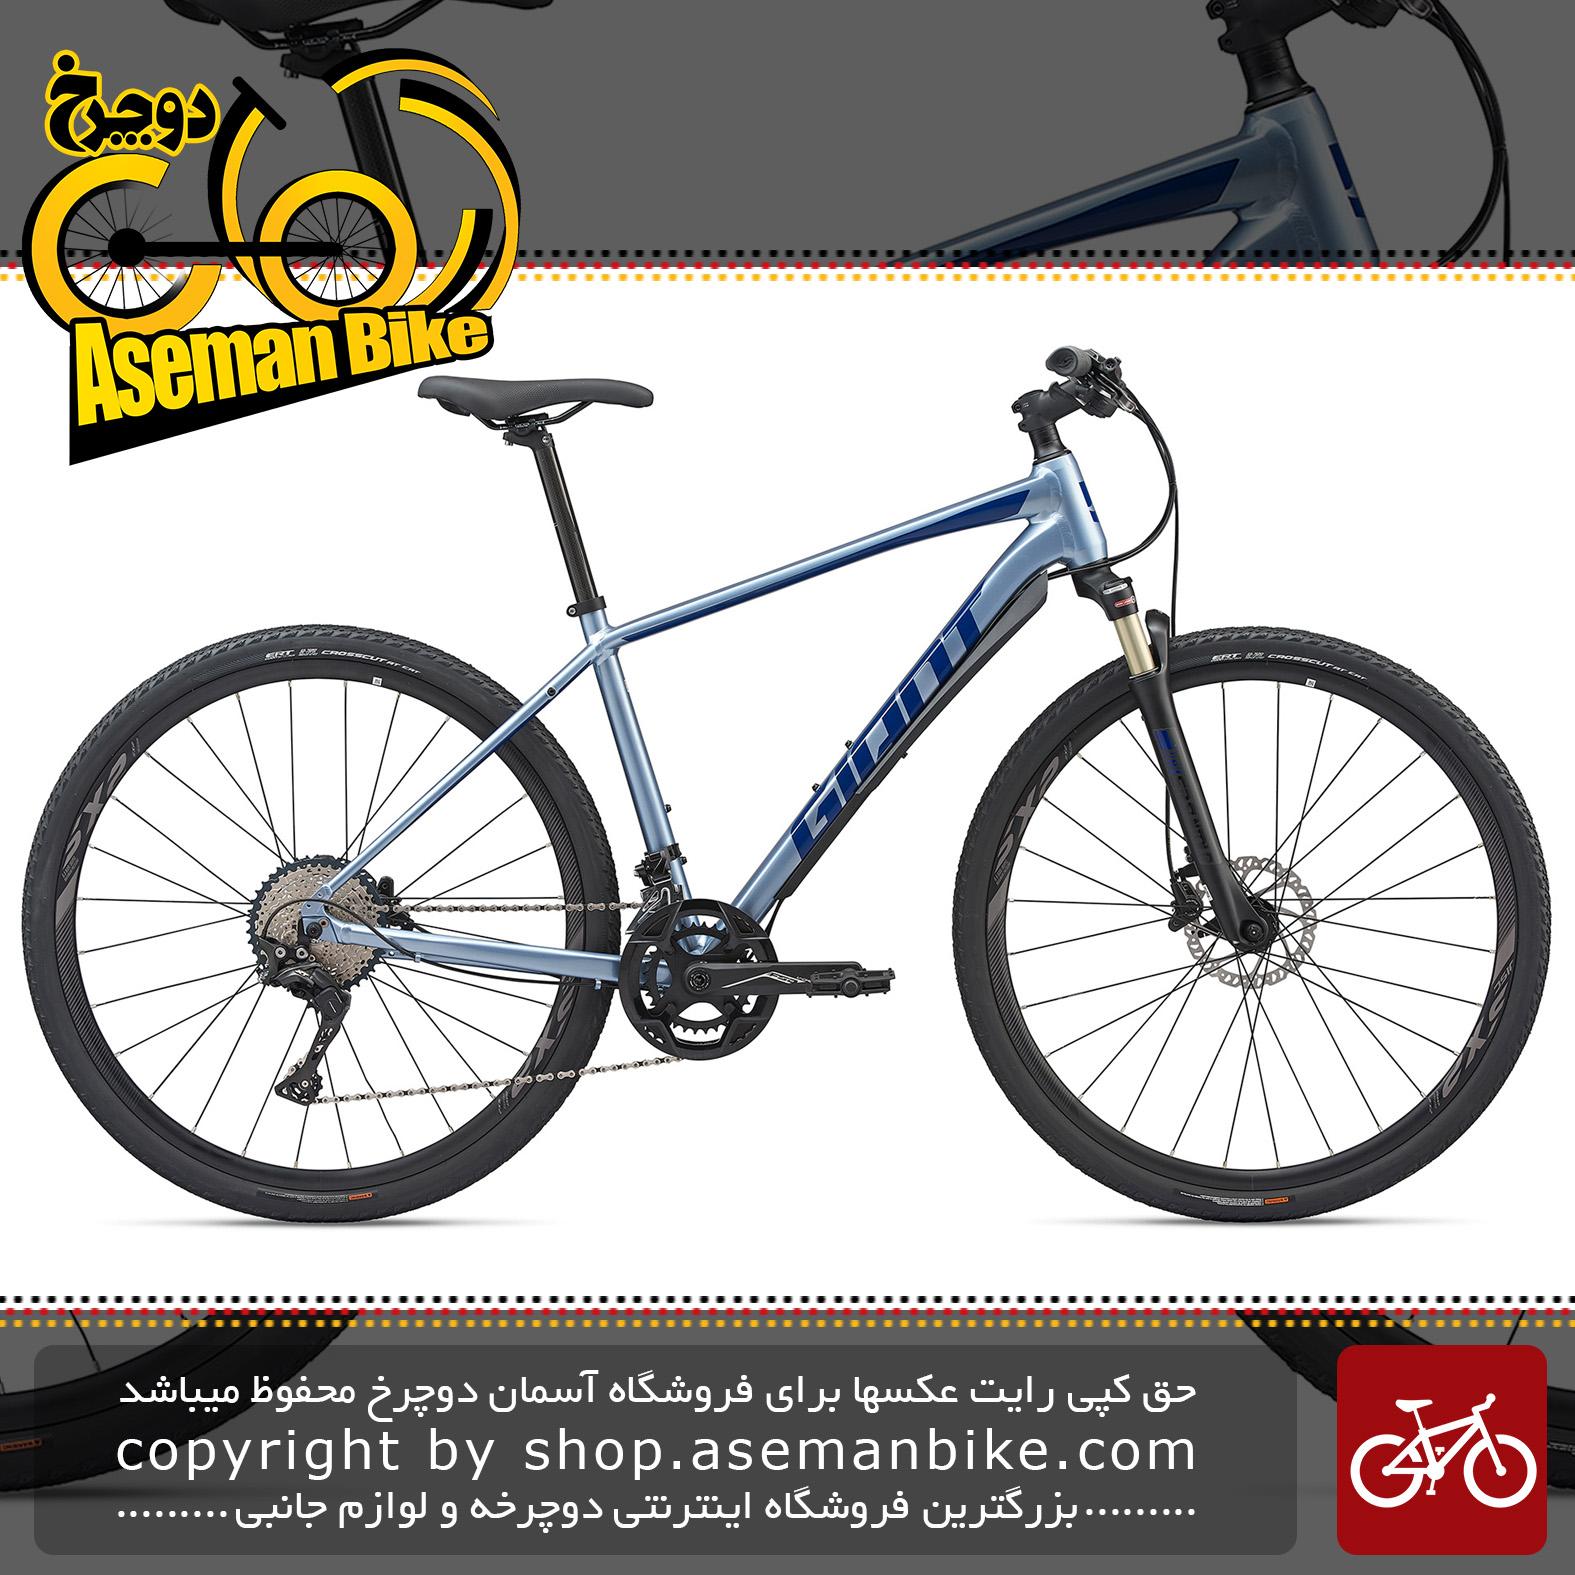 دوچرخه دومنظوره جاینت مدل روآم 0 دیسک هیدرولیک 2020 Giant Adventure Bicycle Roam 0 Disc 2020